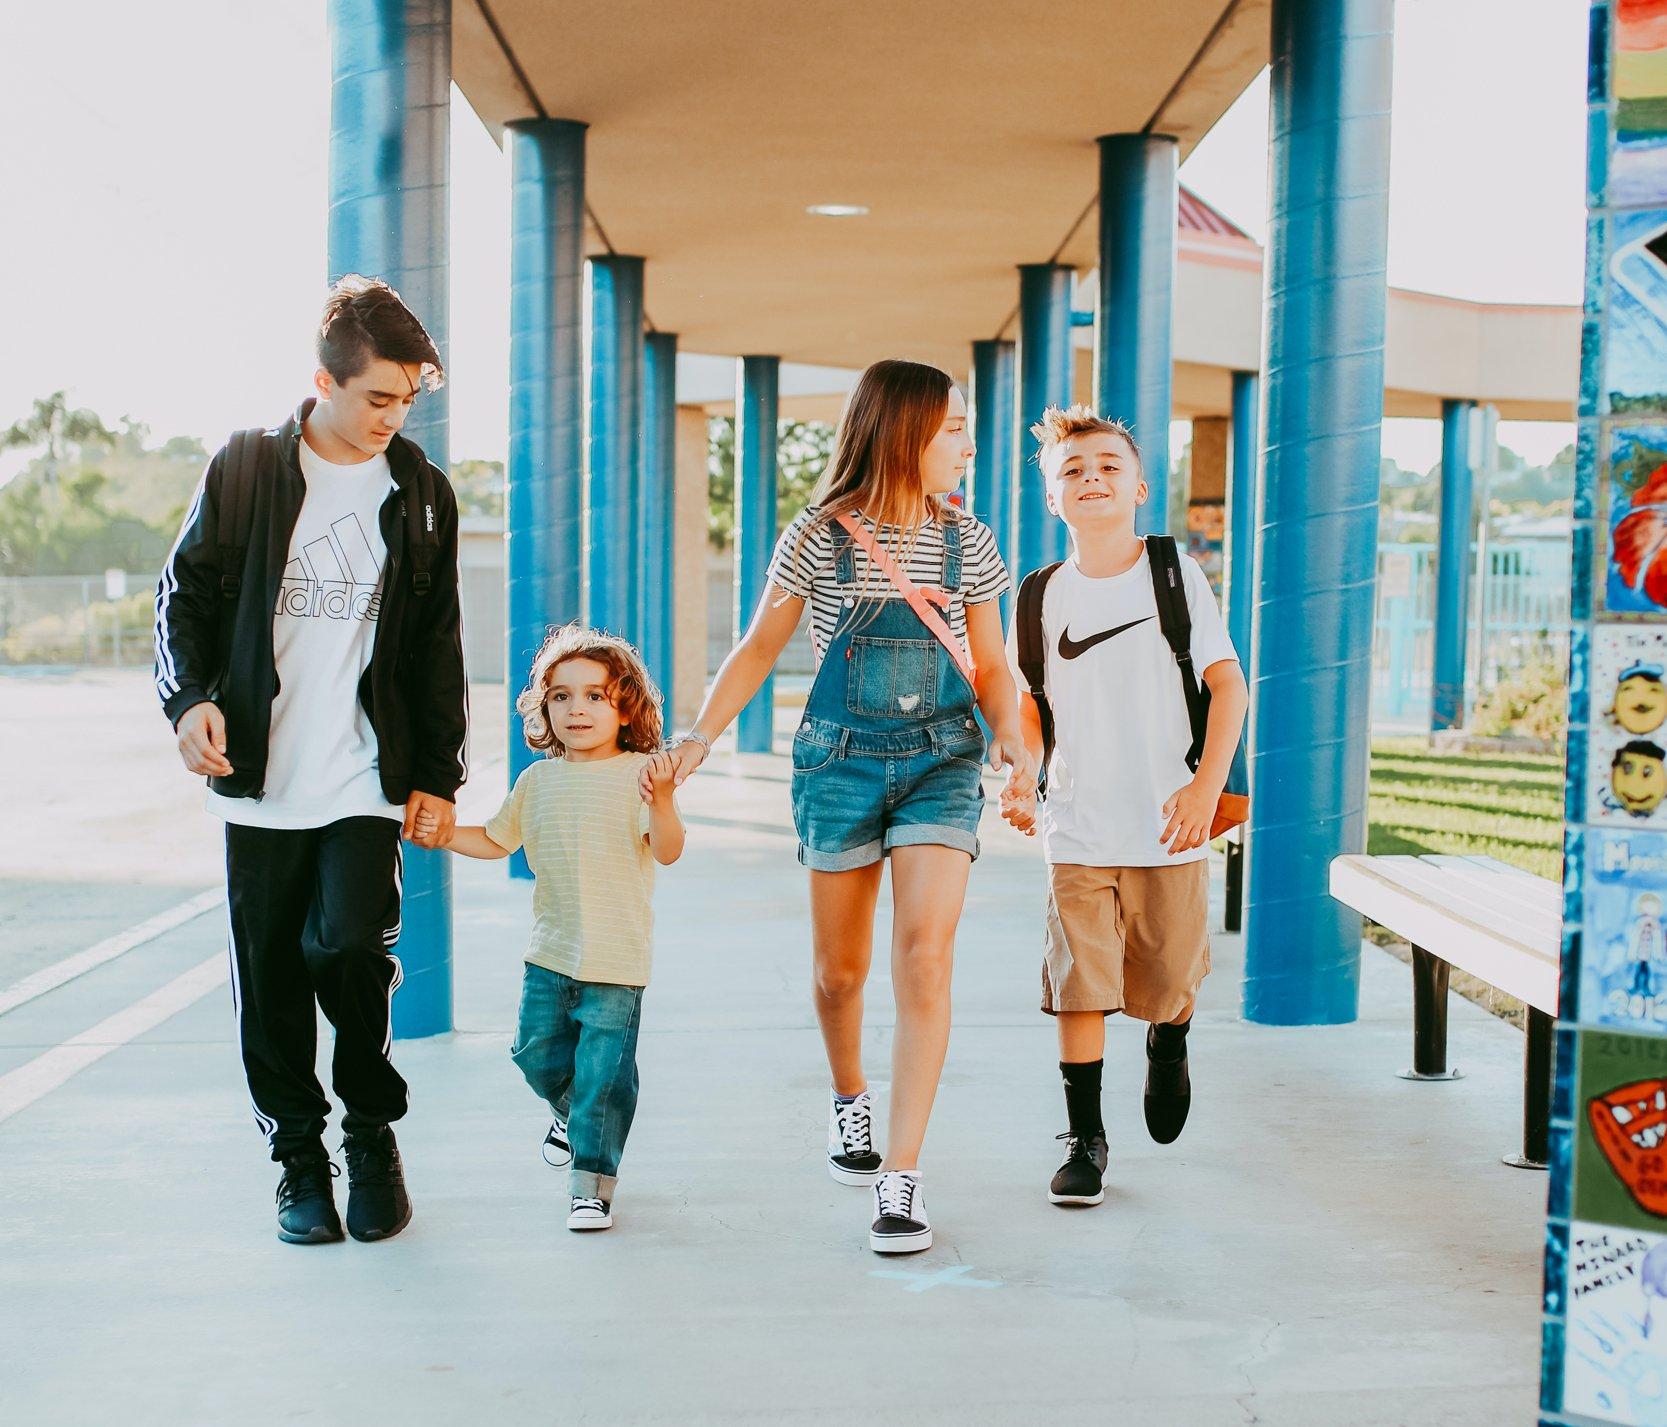 kids walking at school